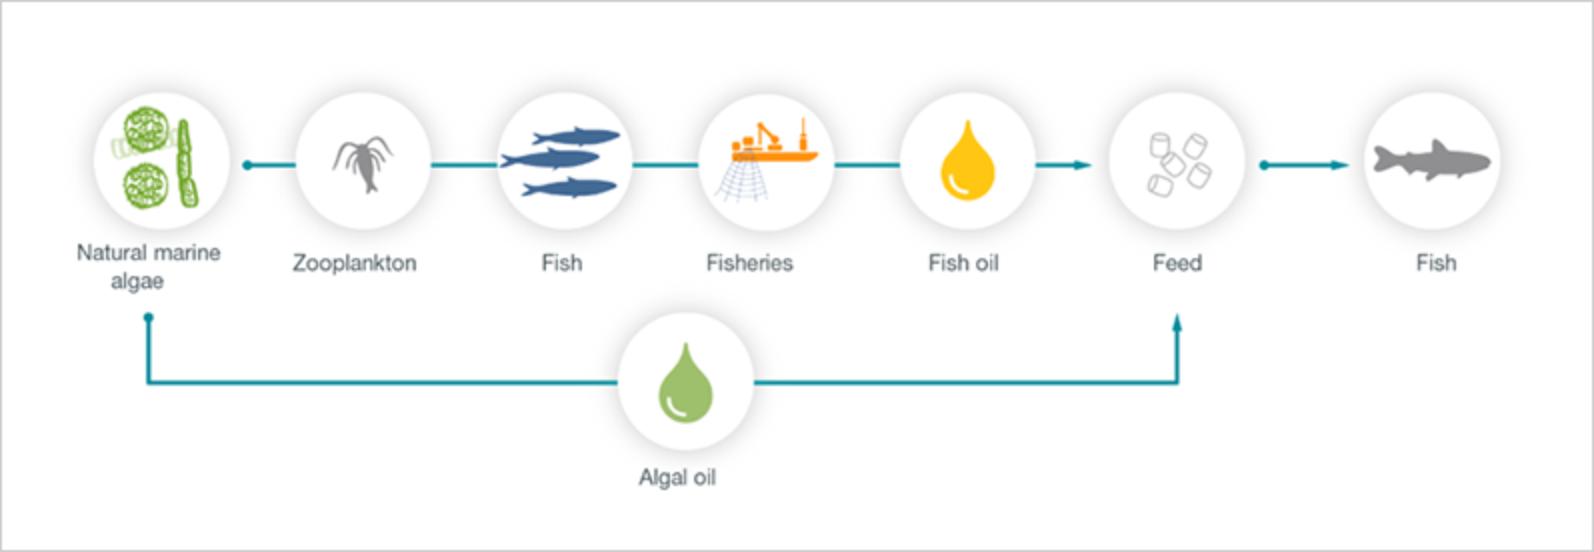 Tackling Global Challenges Through Innovation Algae